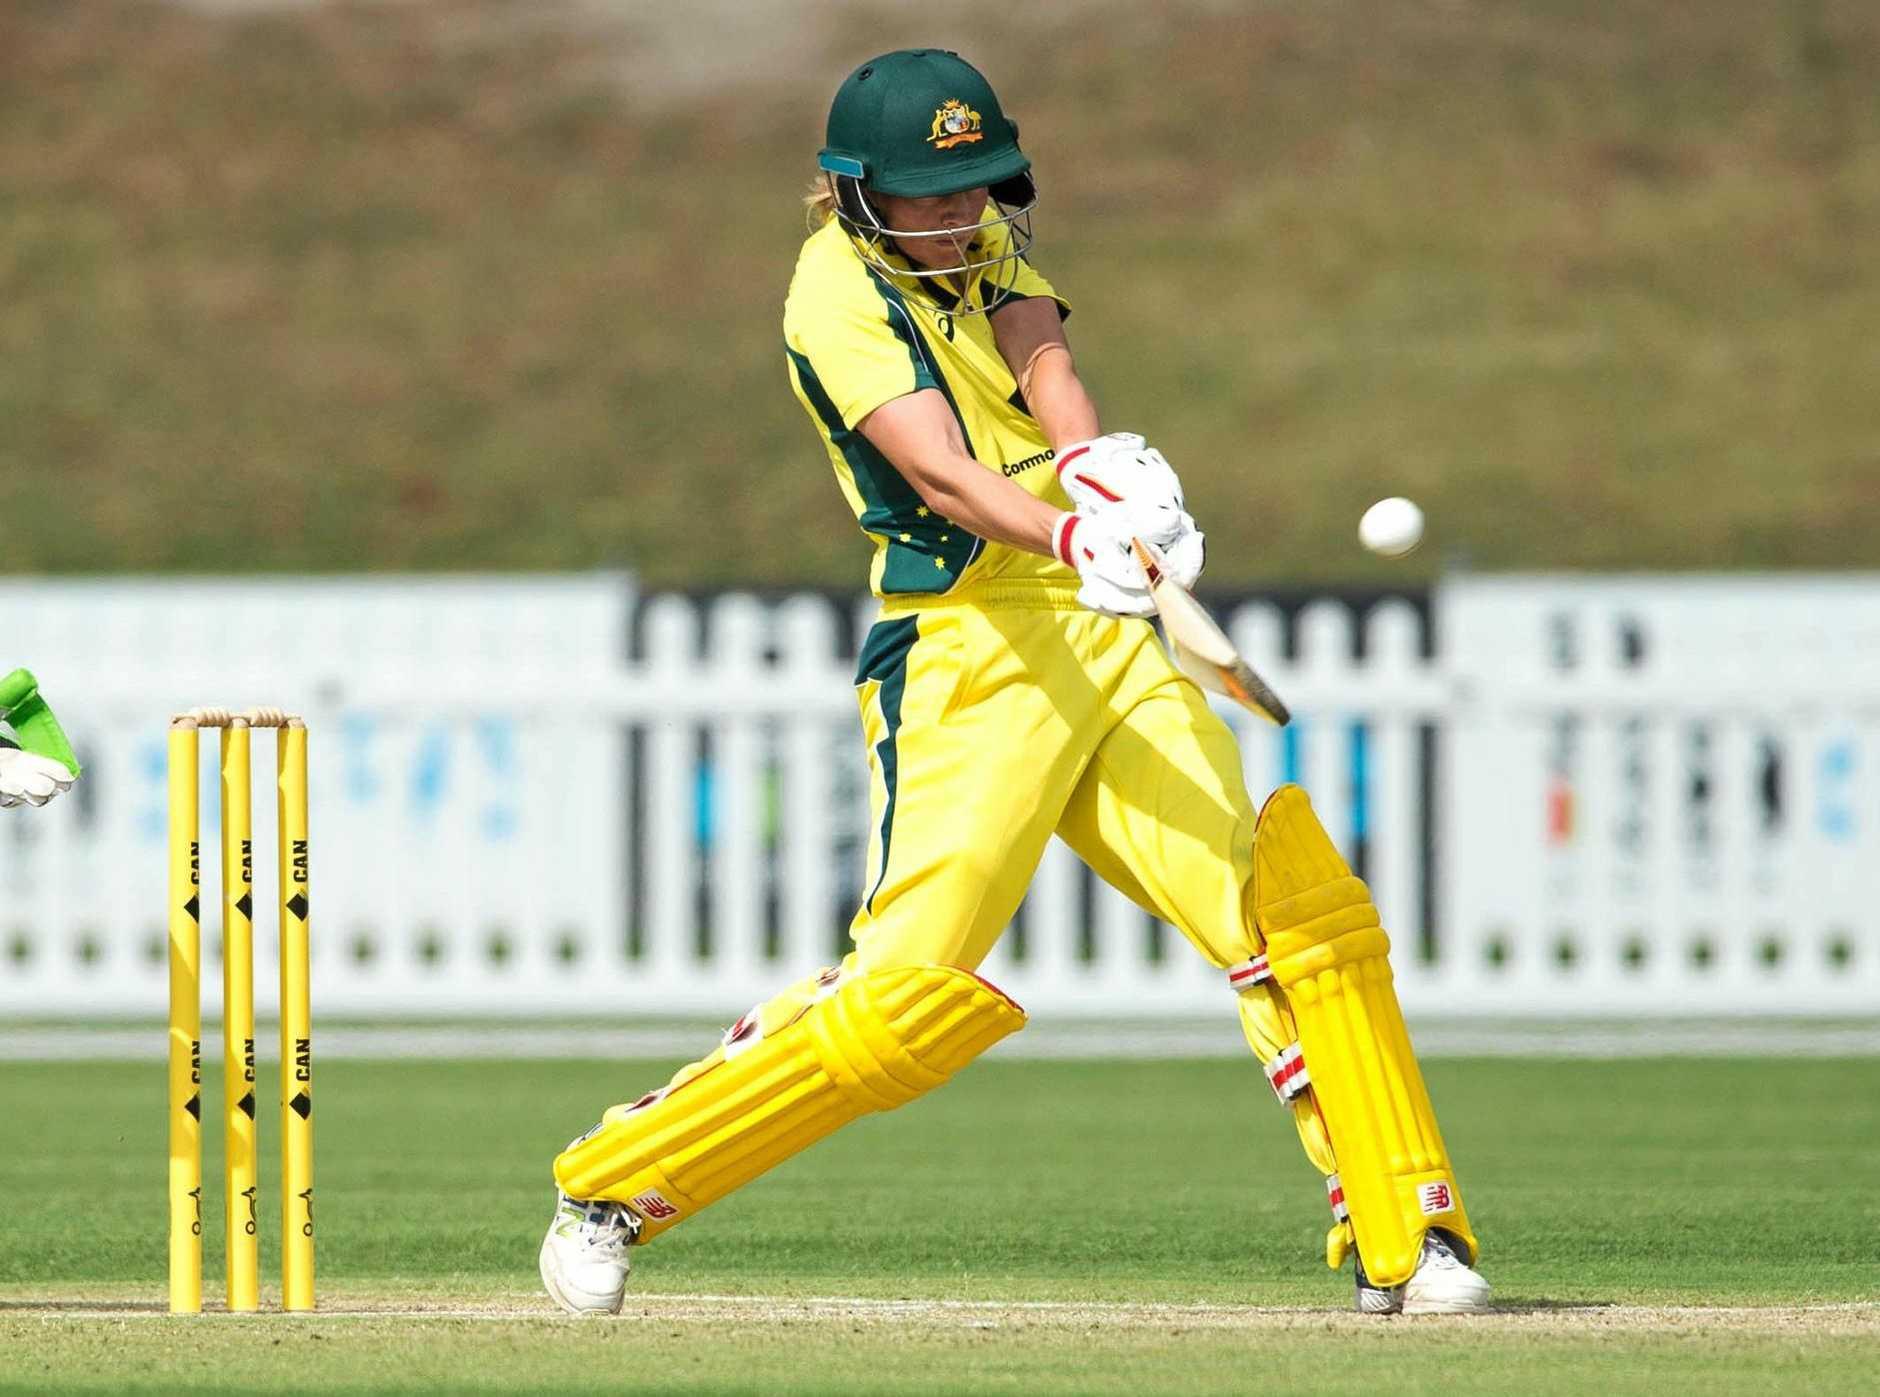 Meg Lanning in action for the Australian women's cricket team last season.